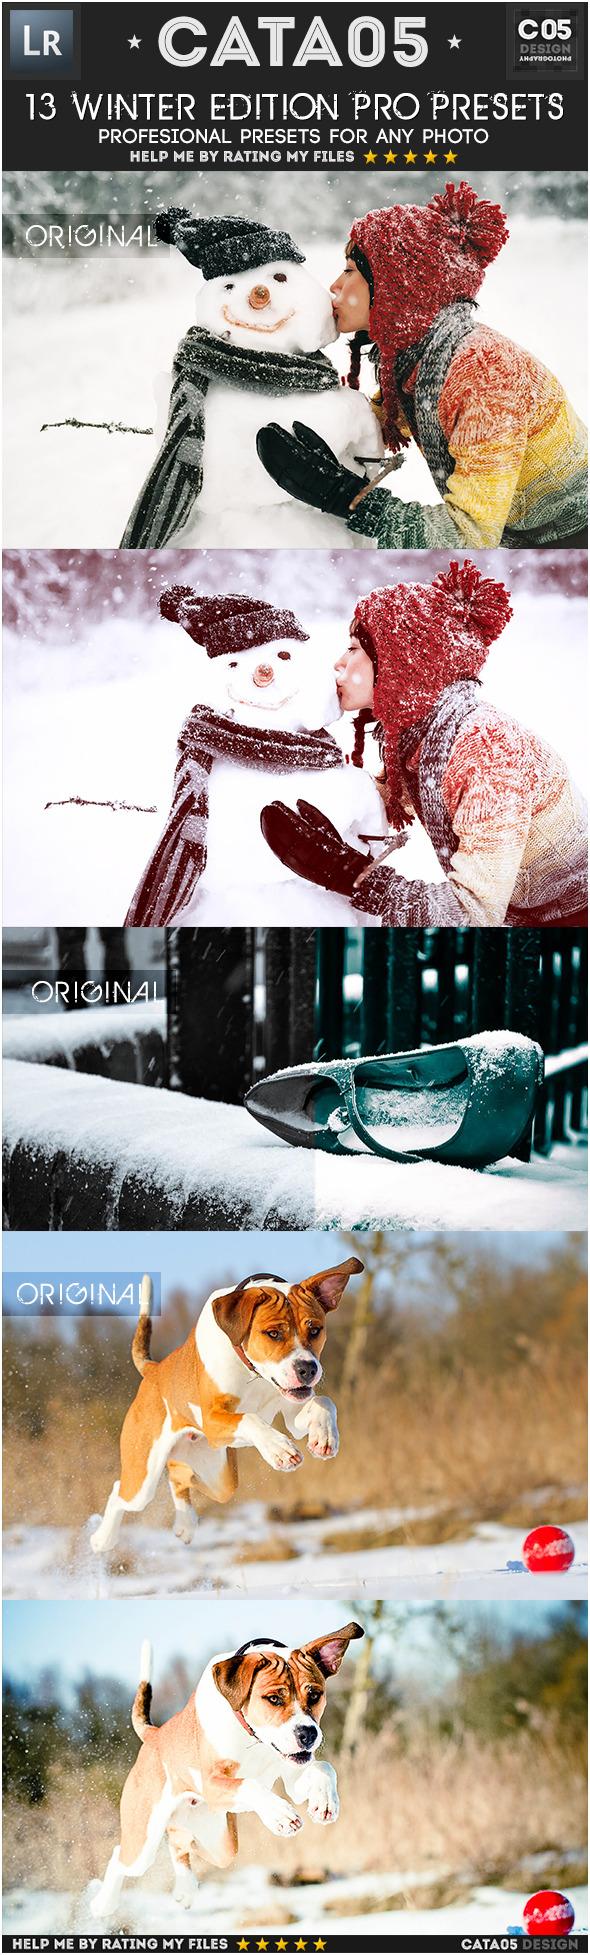 13 Winter Edition Pro Presets - Portrait Lightroom Presets